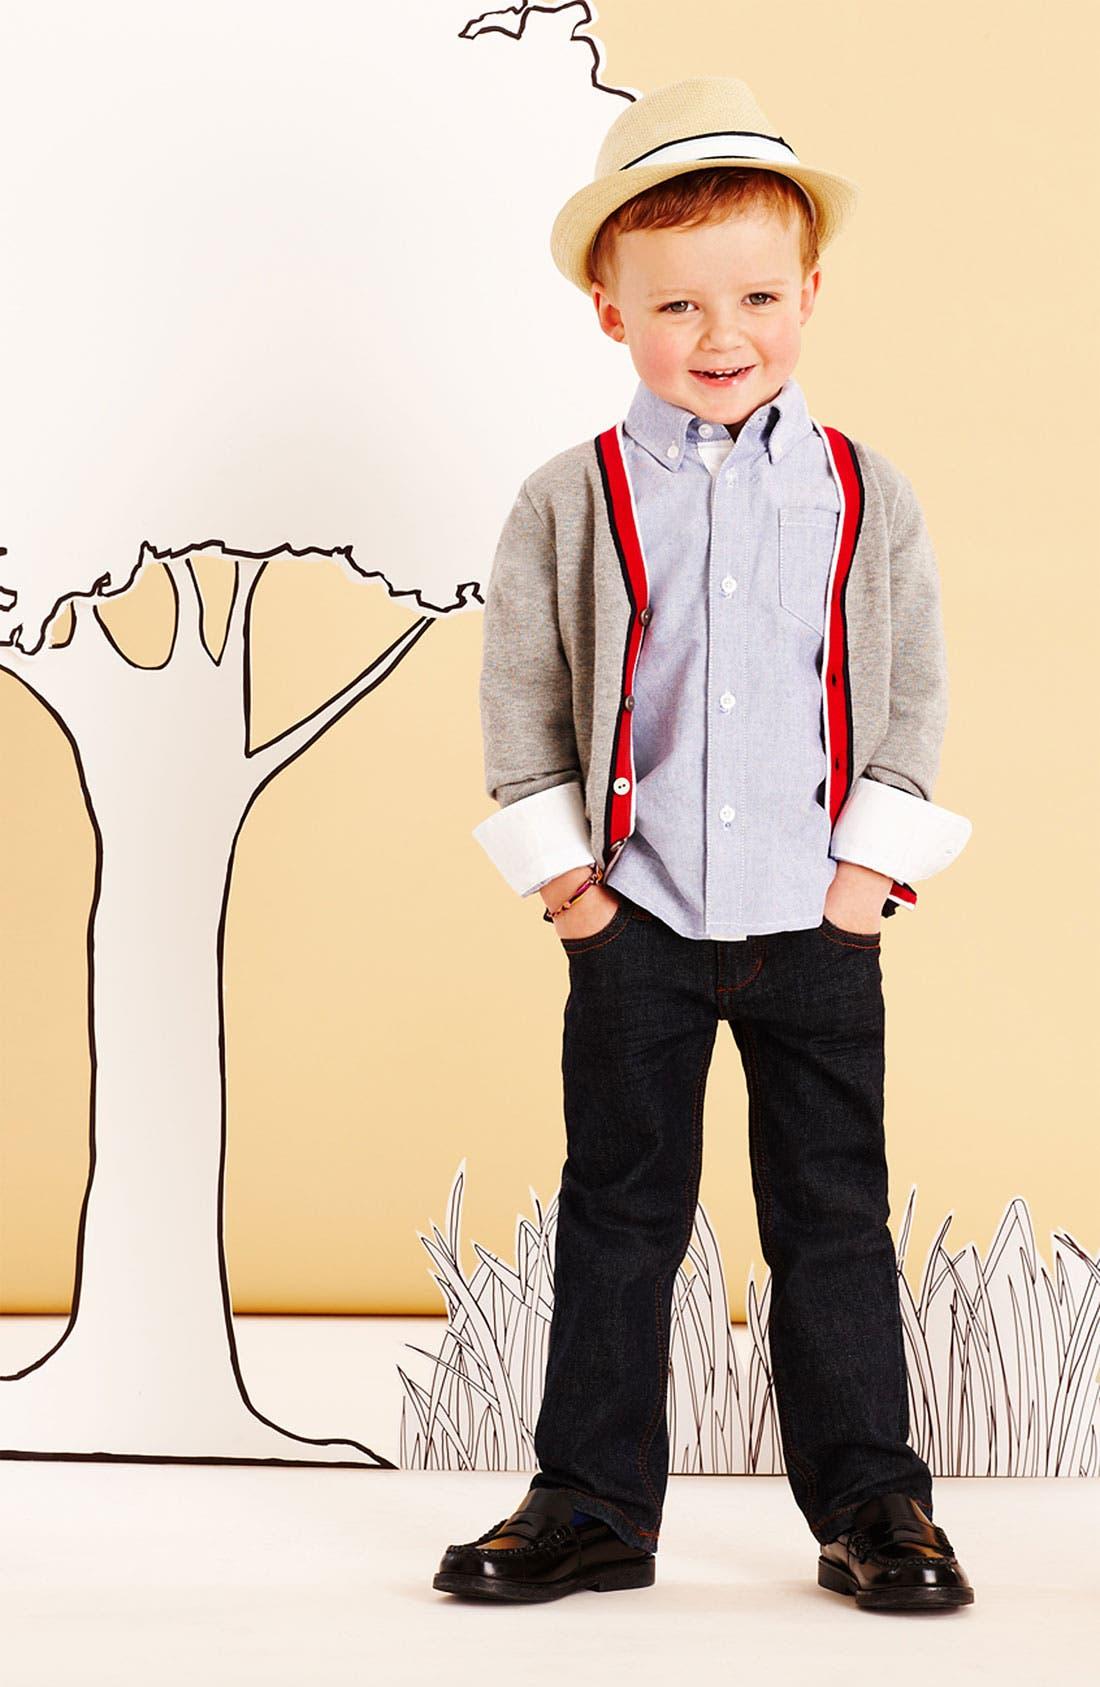 Alternate Image 1 Selected - Sovereign Code Cardigan, Woven Shirt & Joe's Jeans (Toddler)